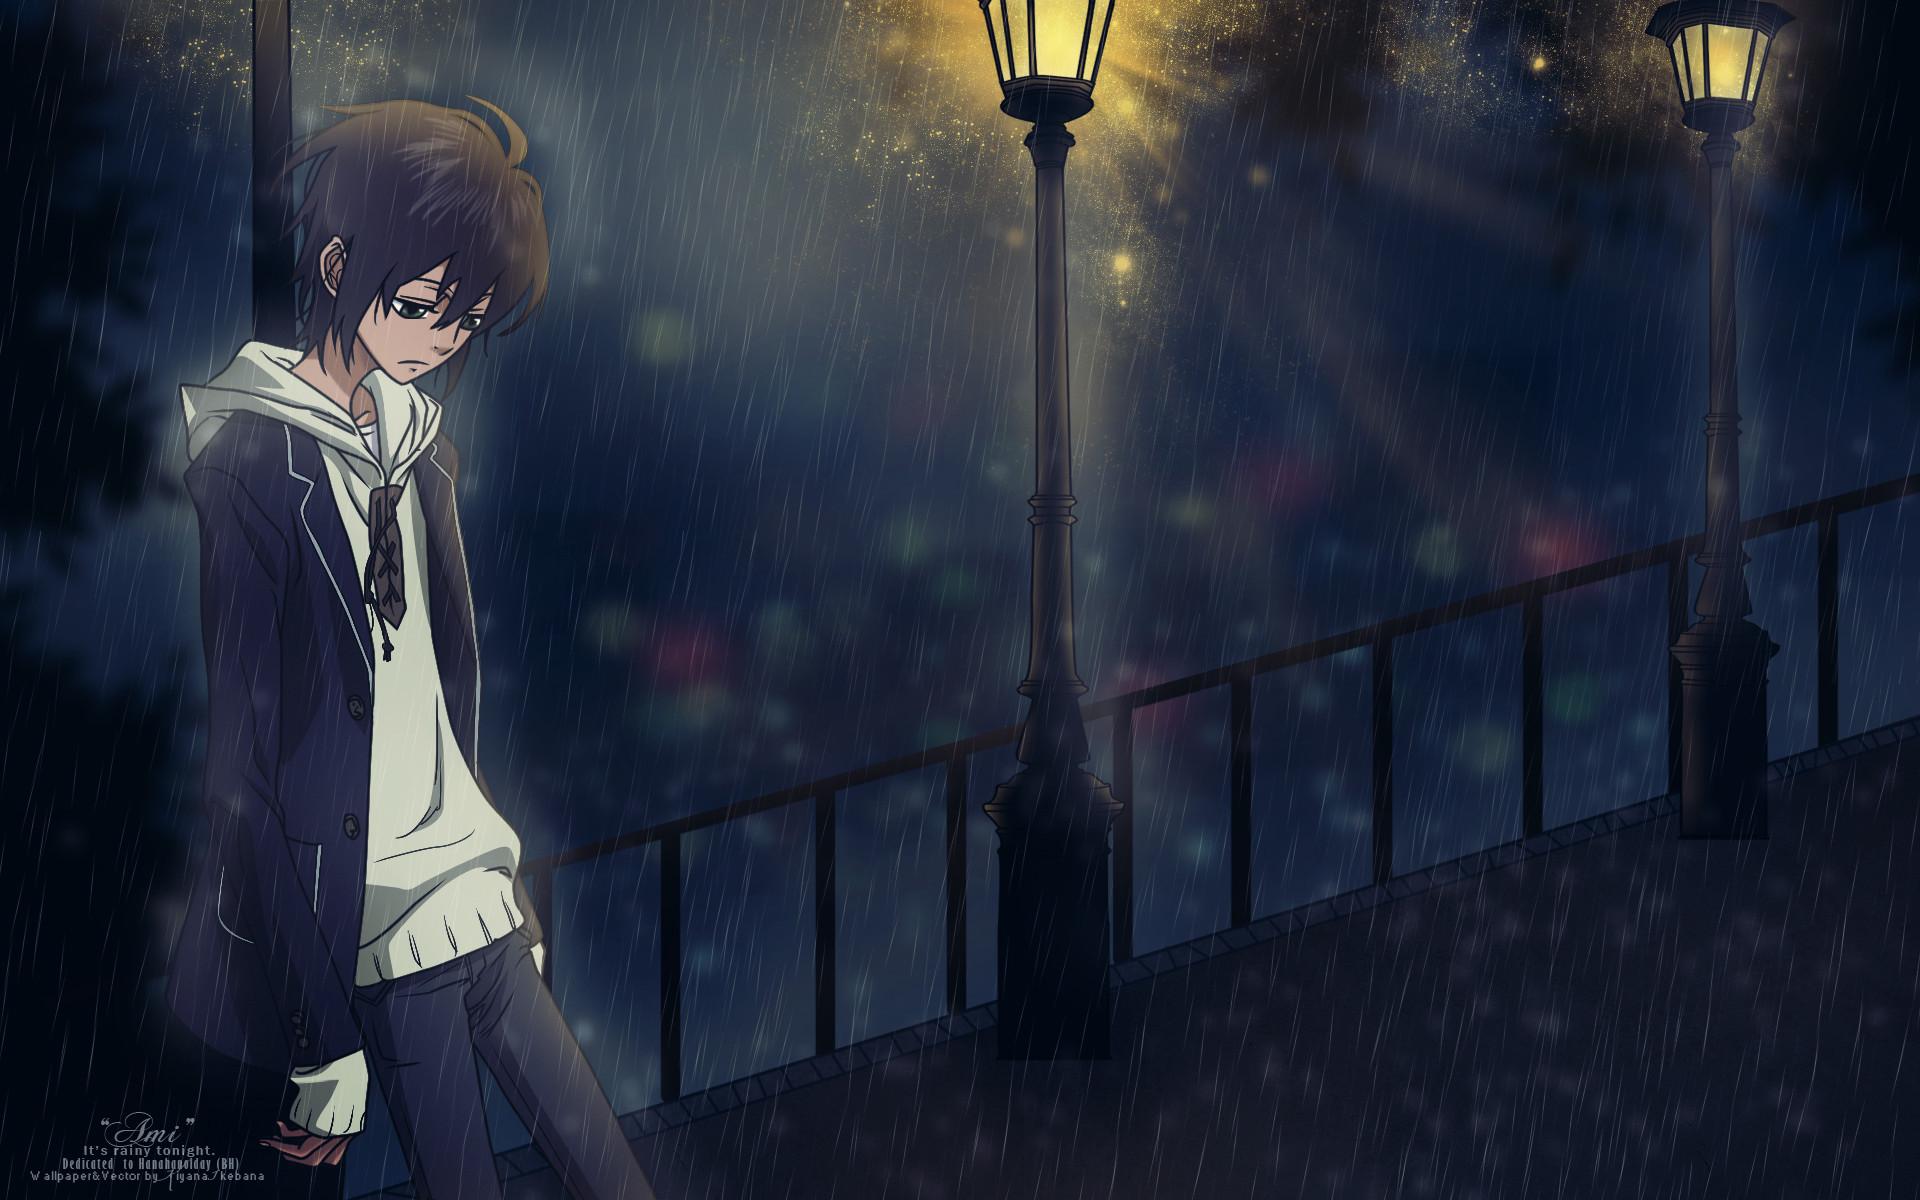 Sad Anime Girl Crying In The Rain Wallpaper Sad Anime Boy Wallpaper 183 ①